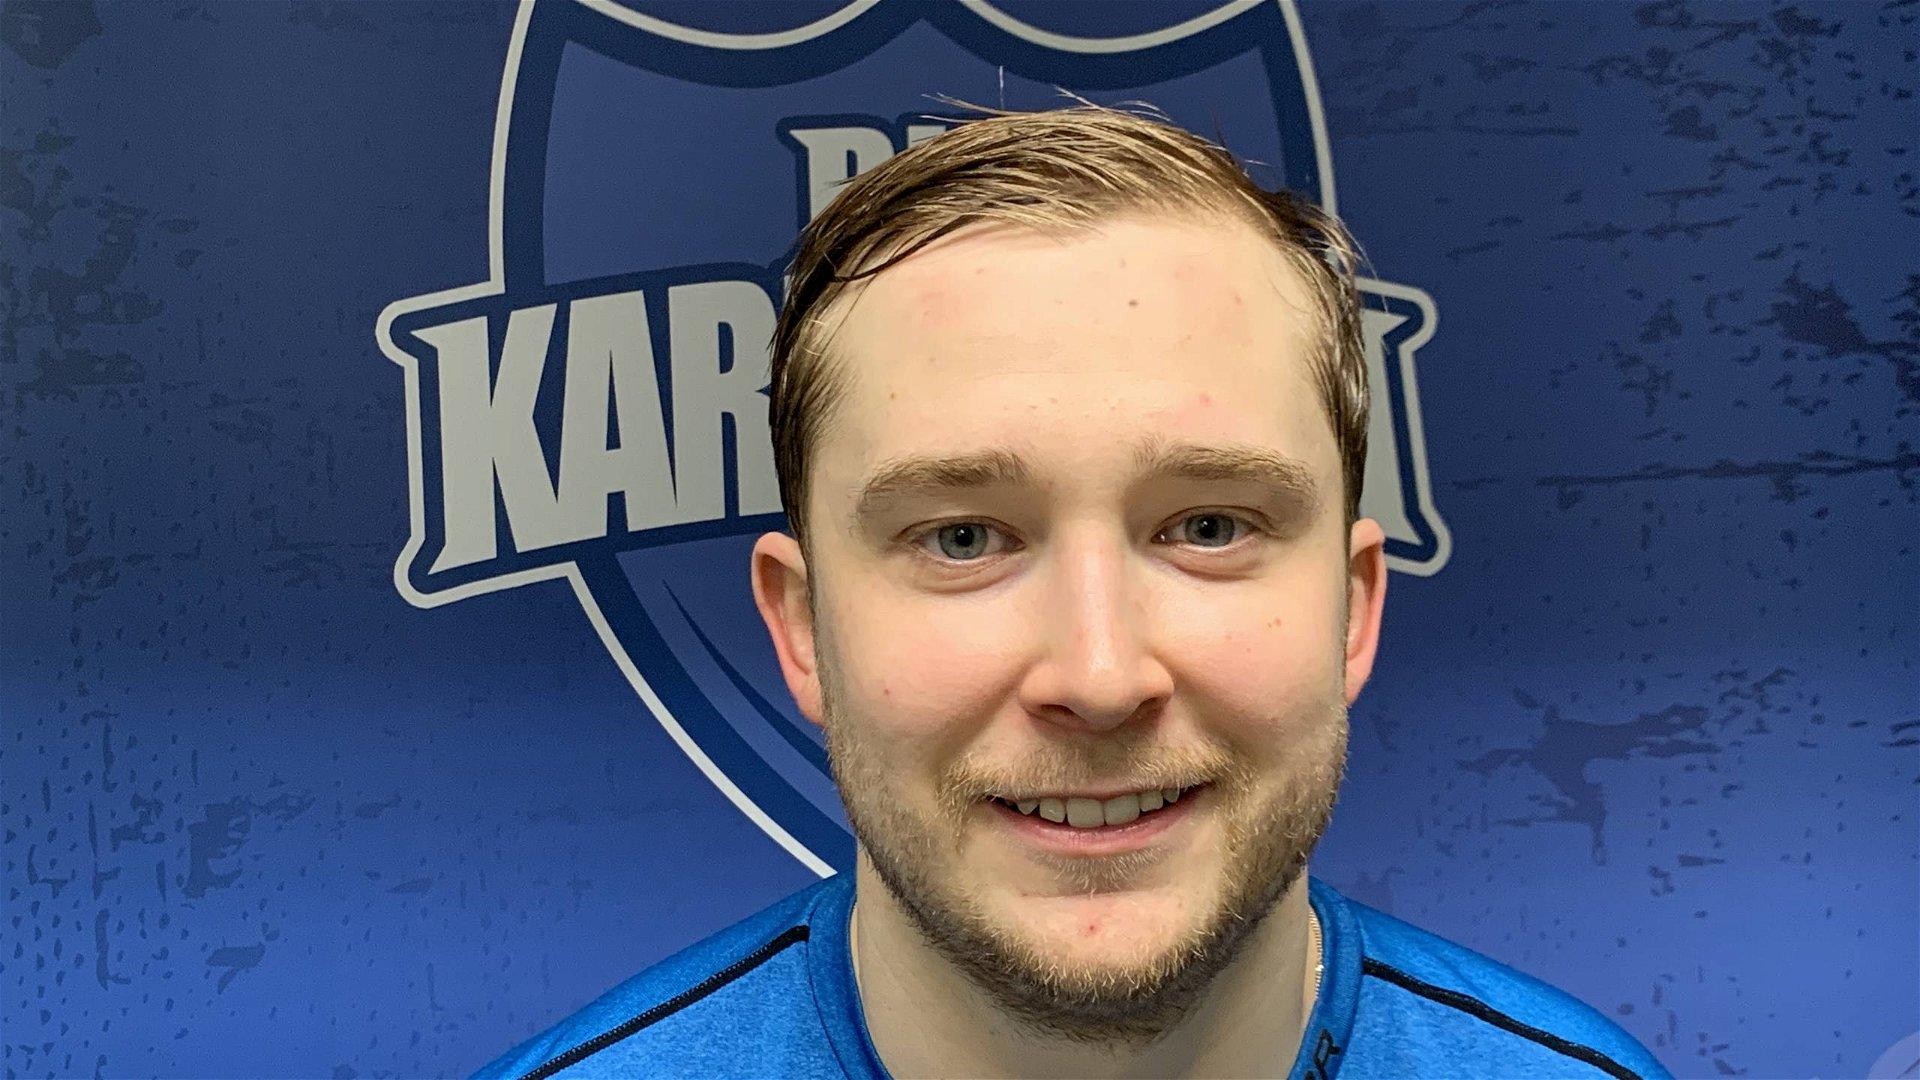 BIK-TV: Eftersnack BIK vs AIK 3-2 7/2 2020